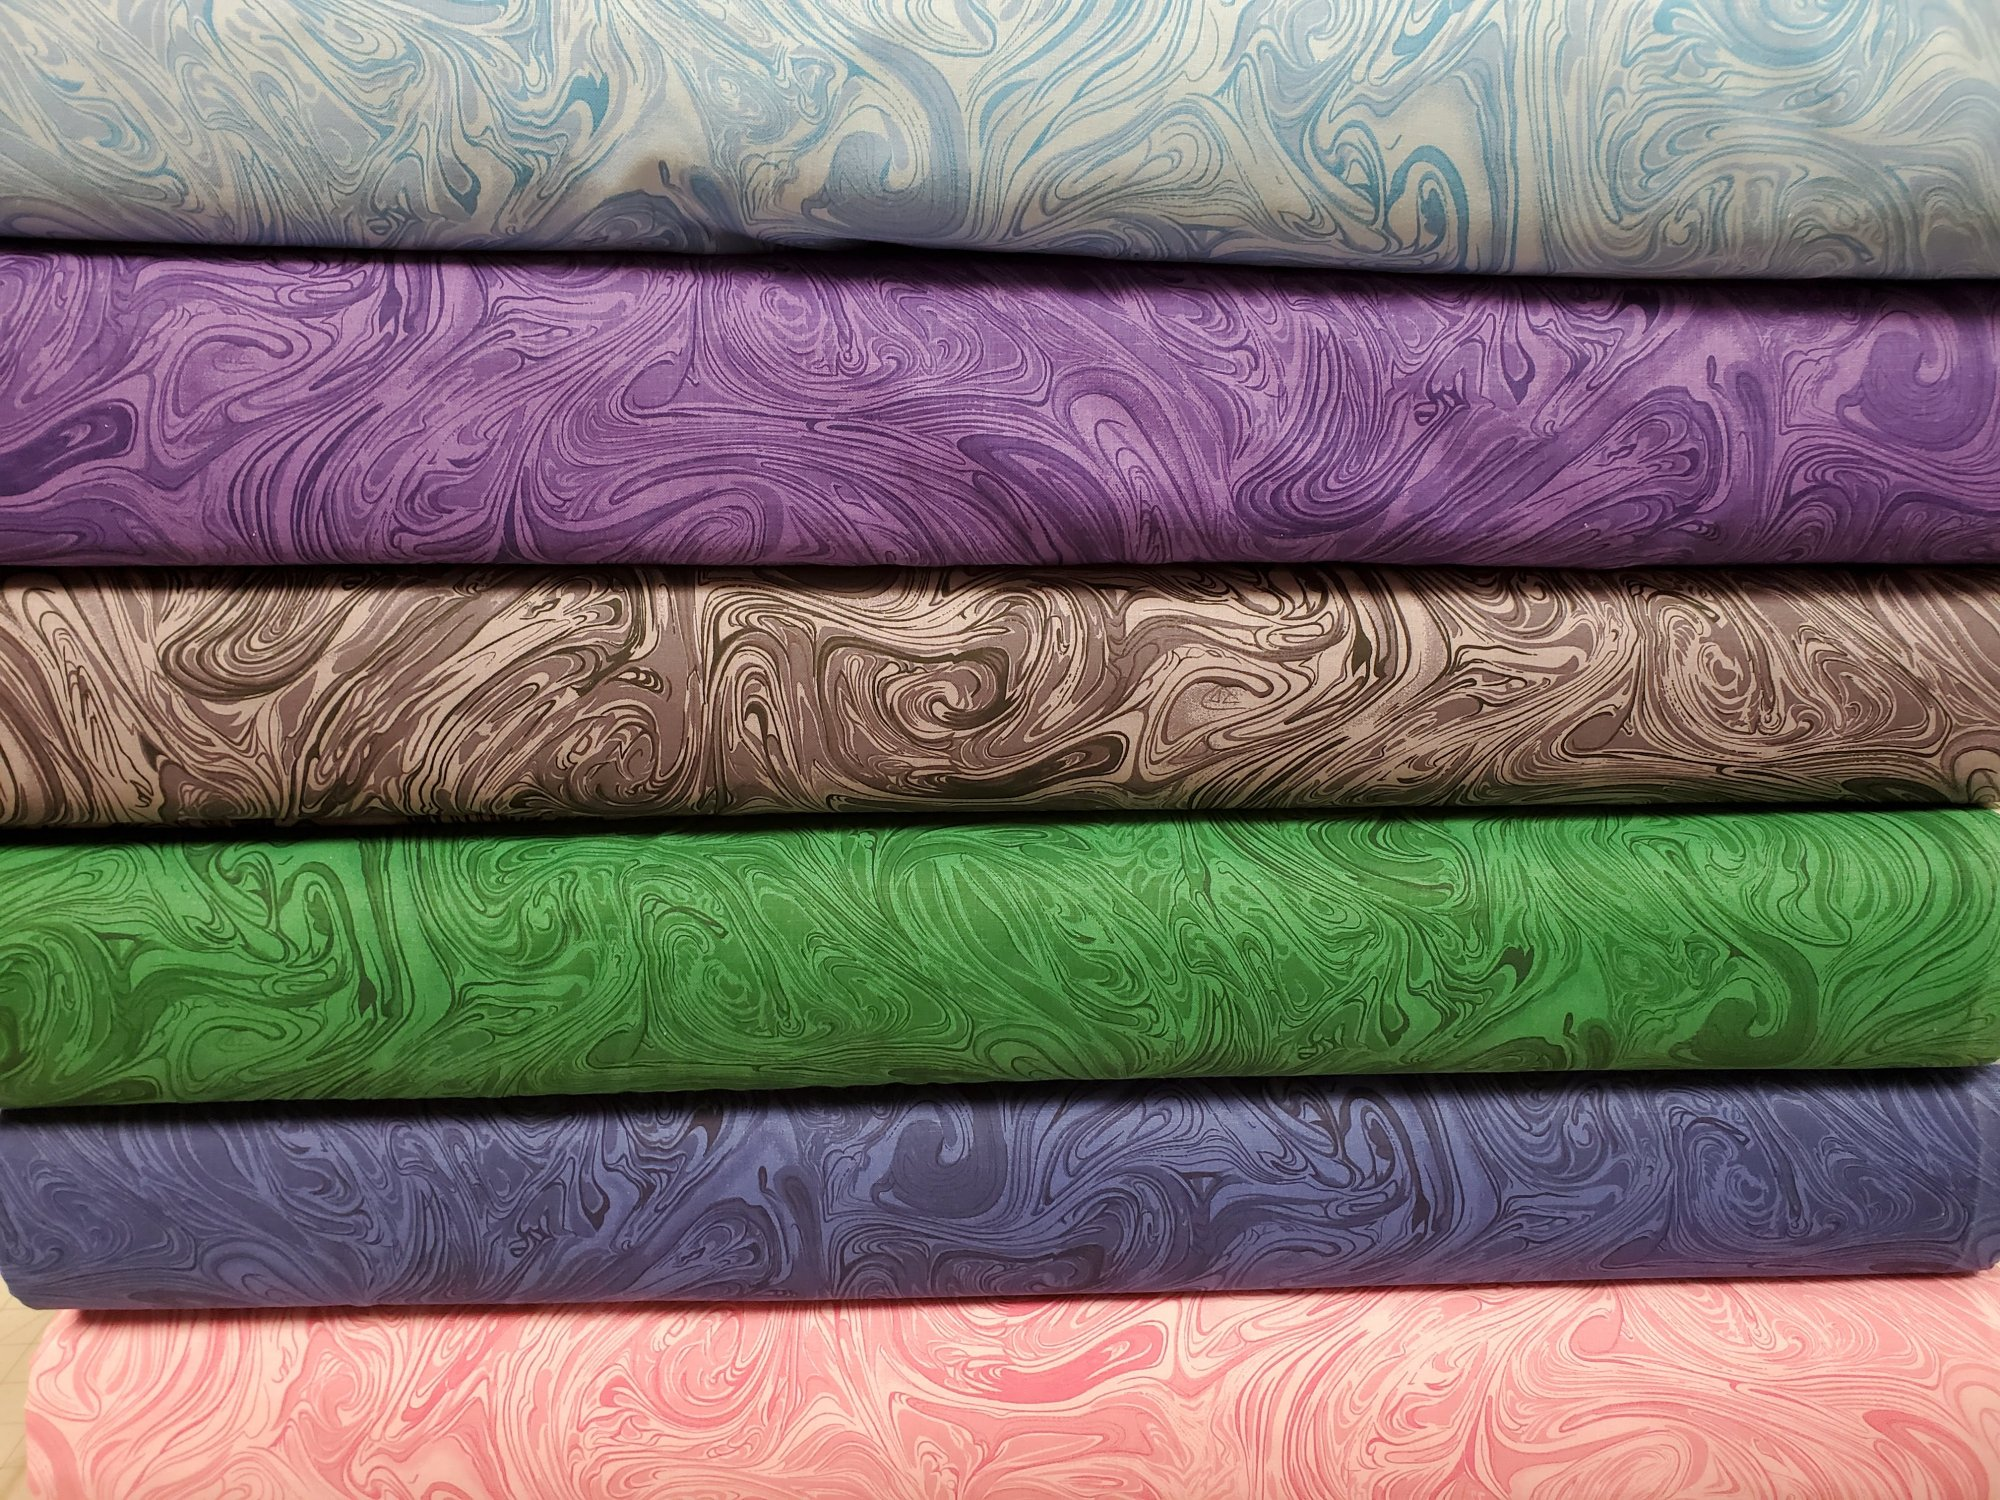 All Varieties of 108 Wide Swirling Marbling Blender BACKING Fabric